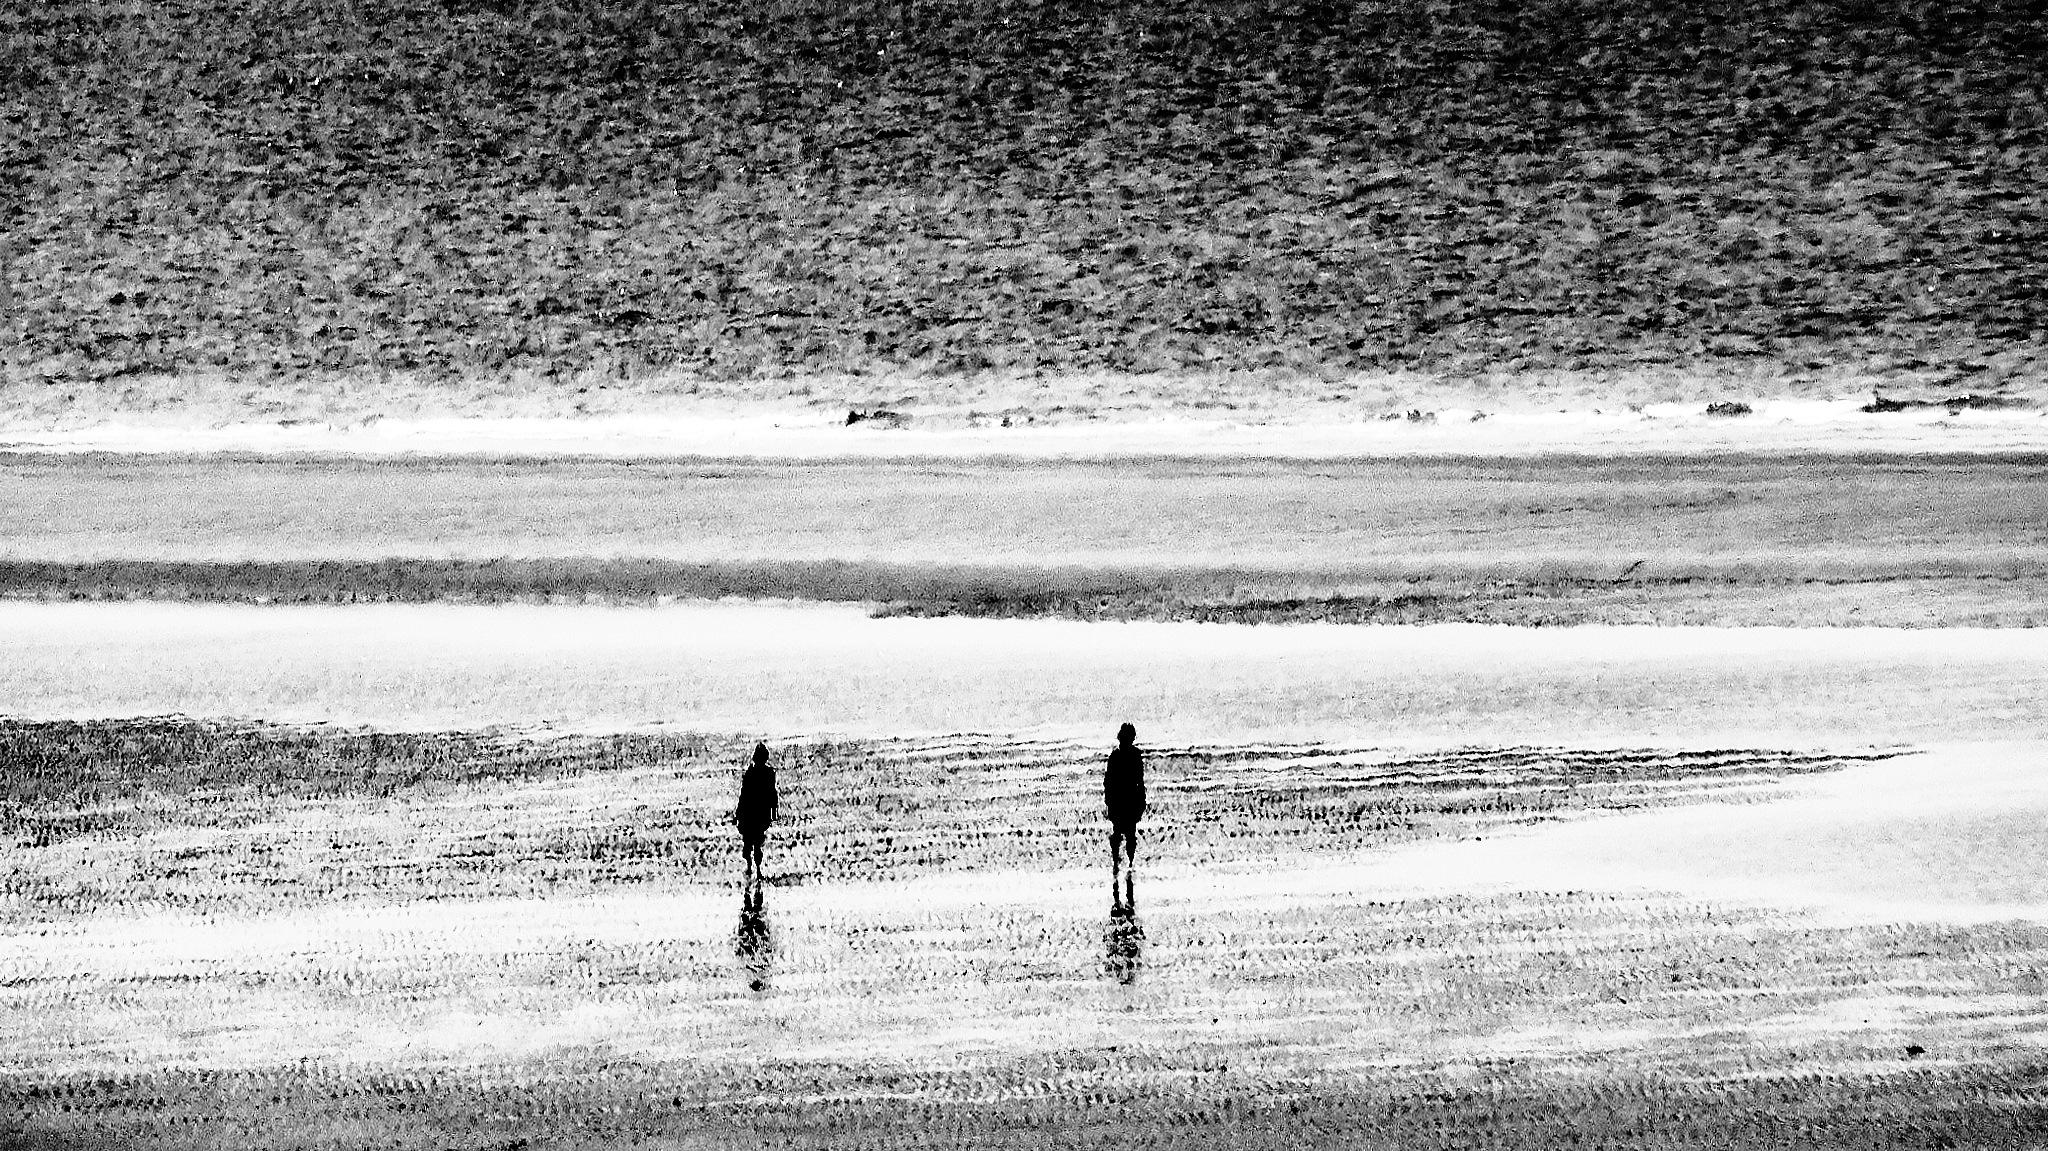 On the beach by Gernot Schwarz